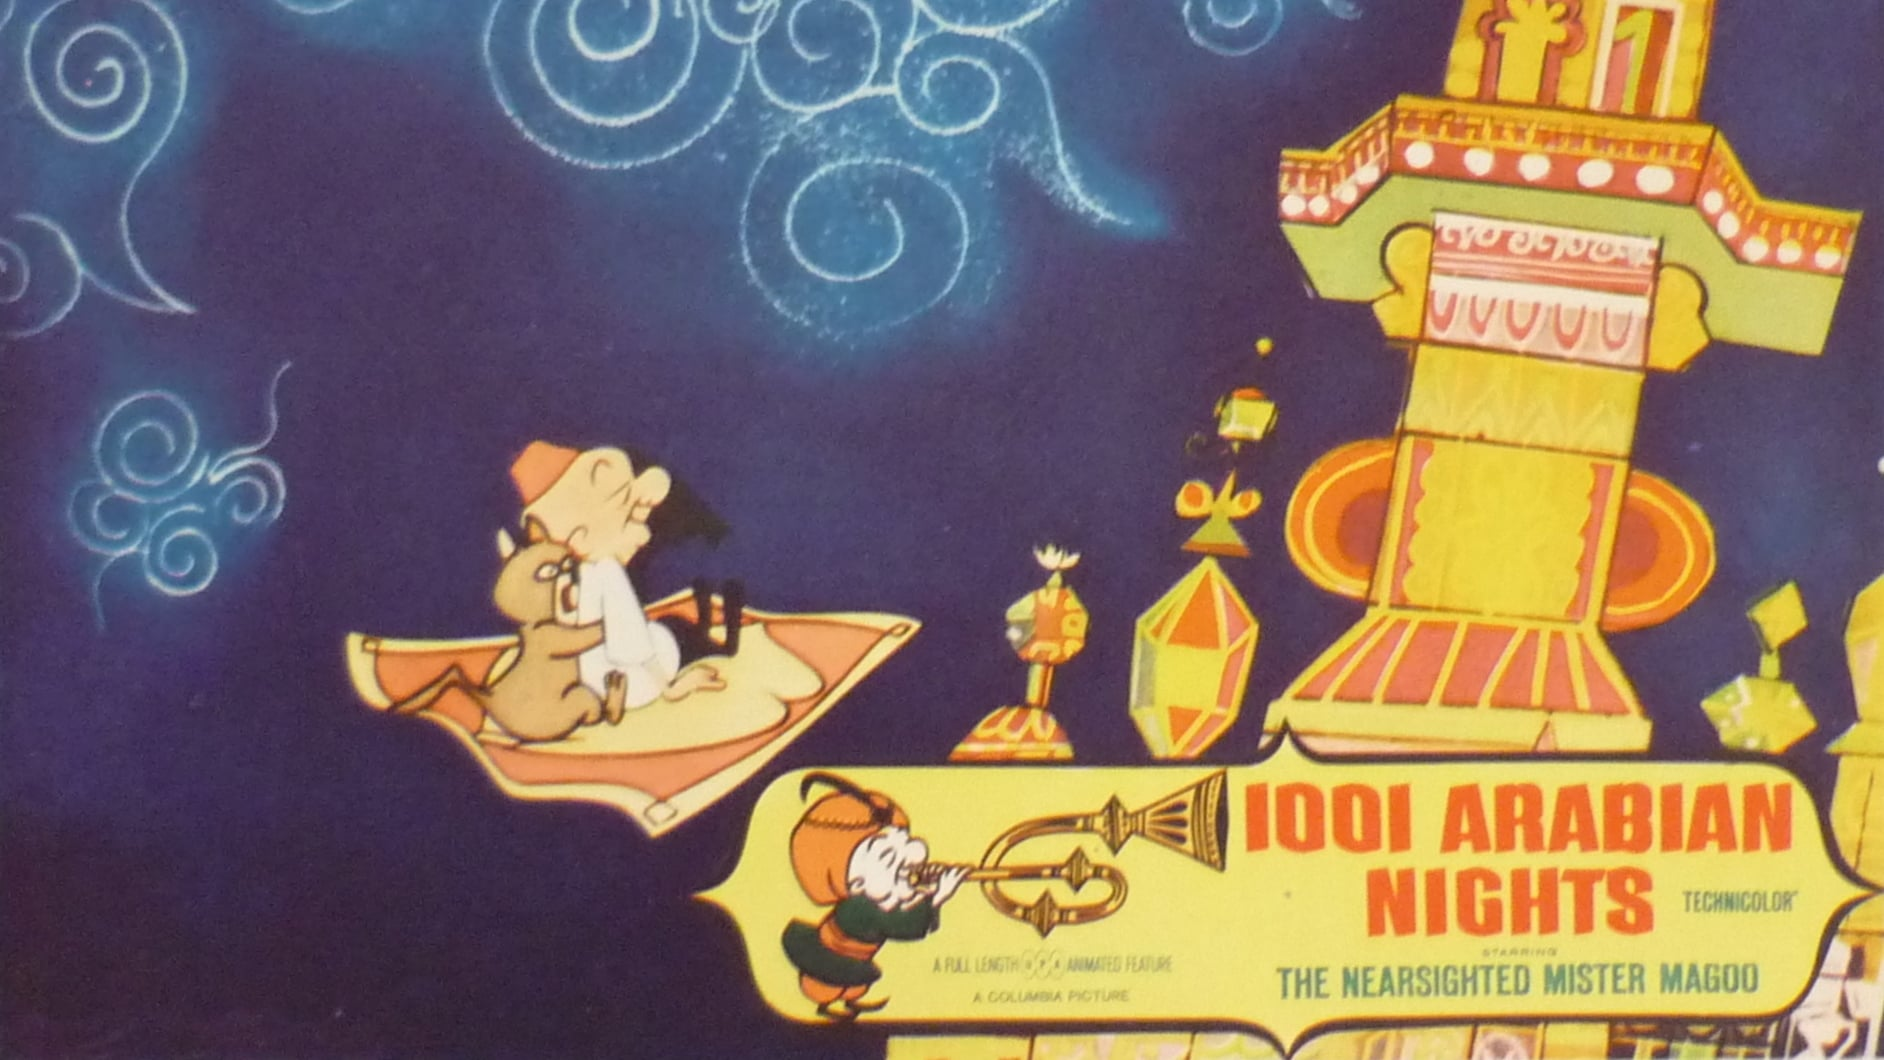 1001 arabian nights pictures Aladdin (disambiguation) - Wikipedia